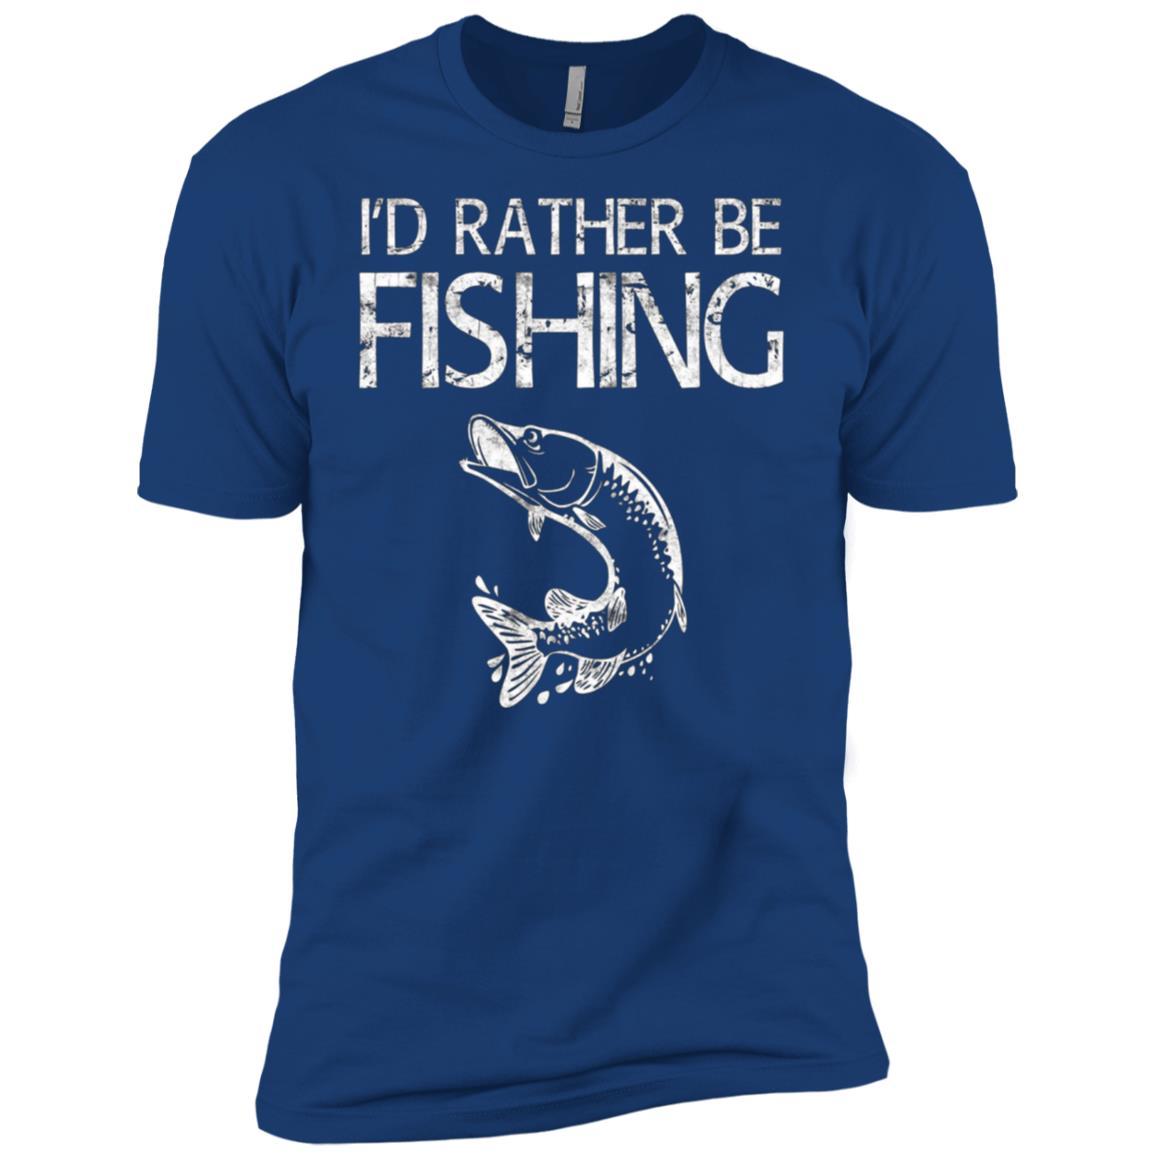 Funny Fisherman Fishing -Tee for young Men Short Sleeve T-Shirt